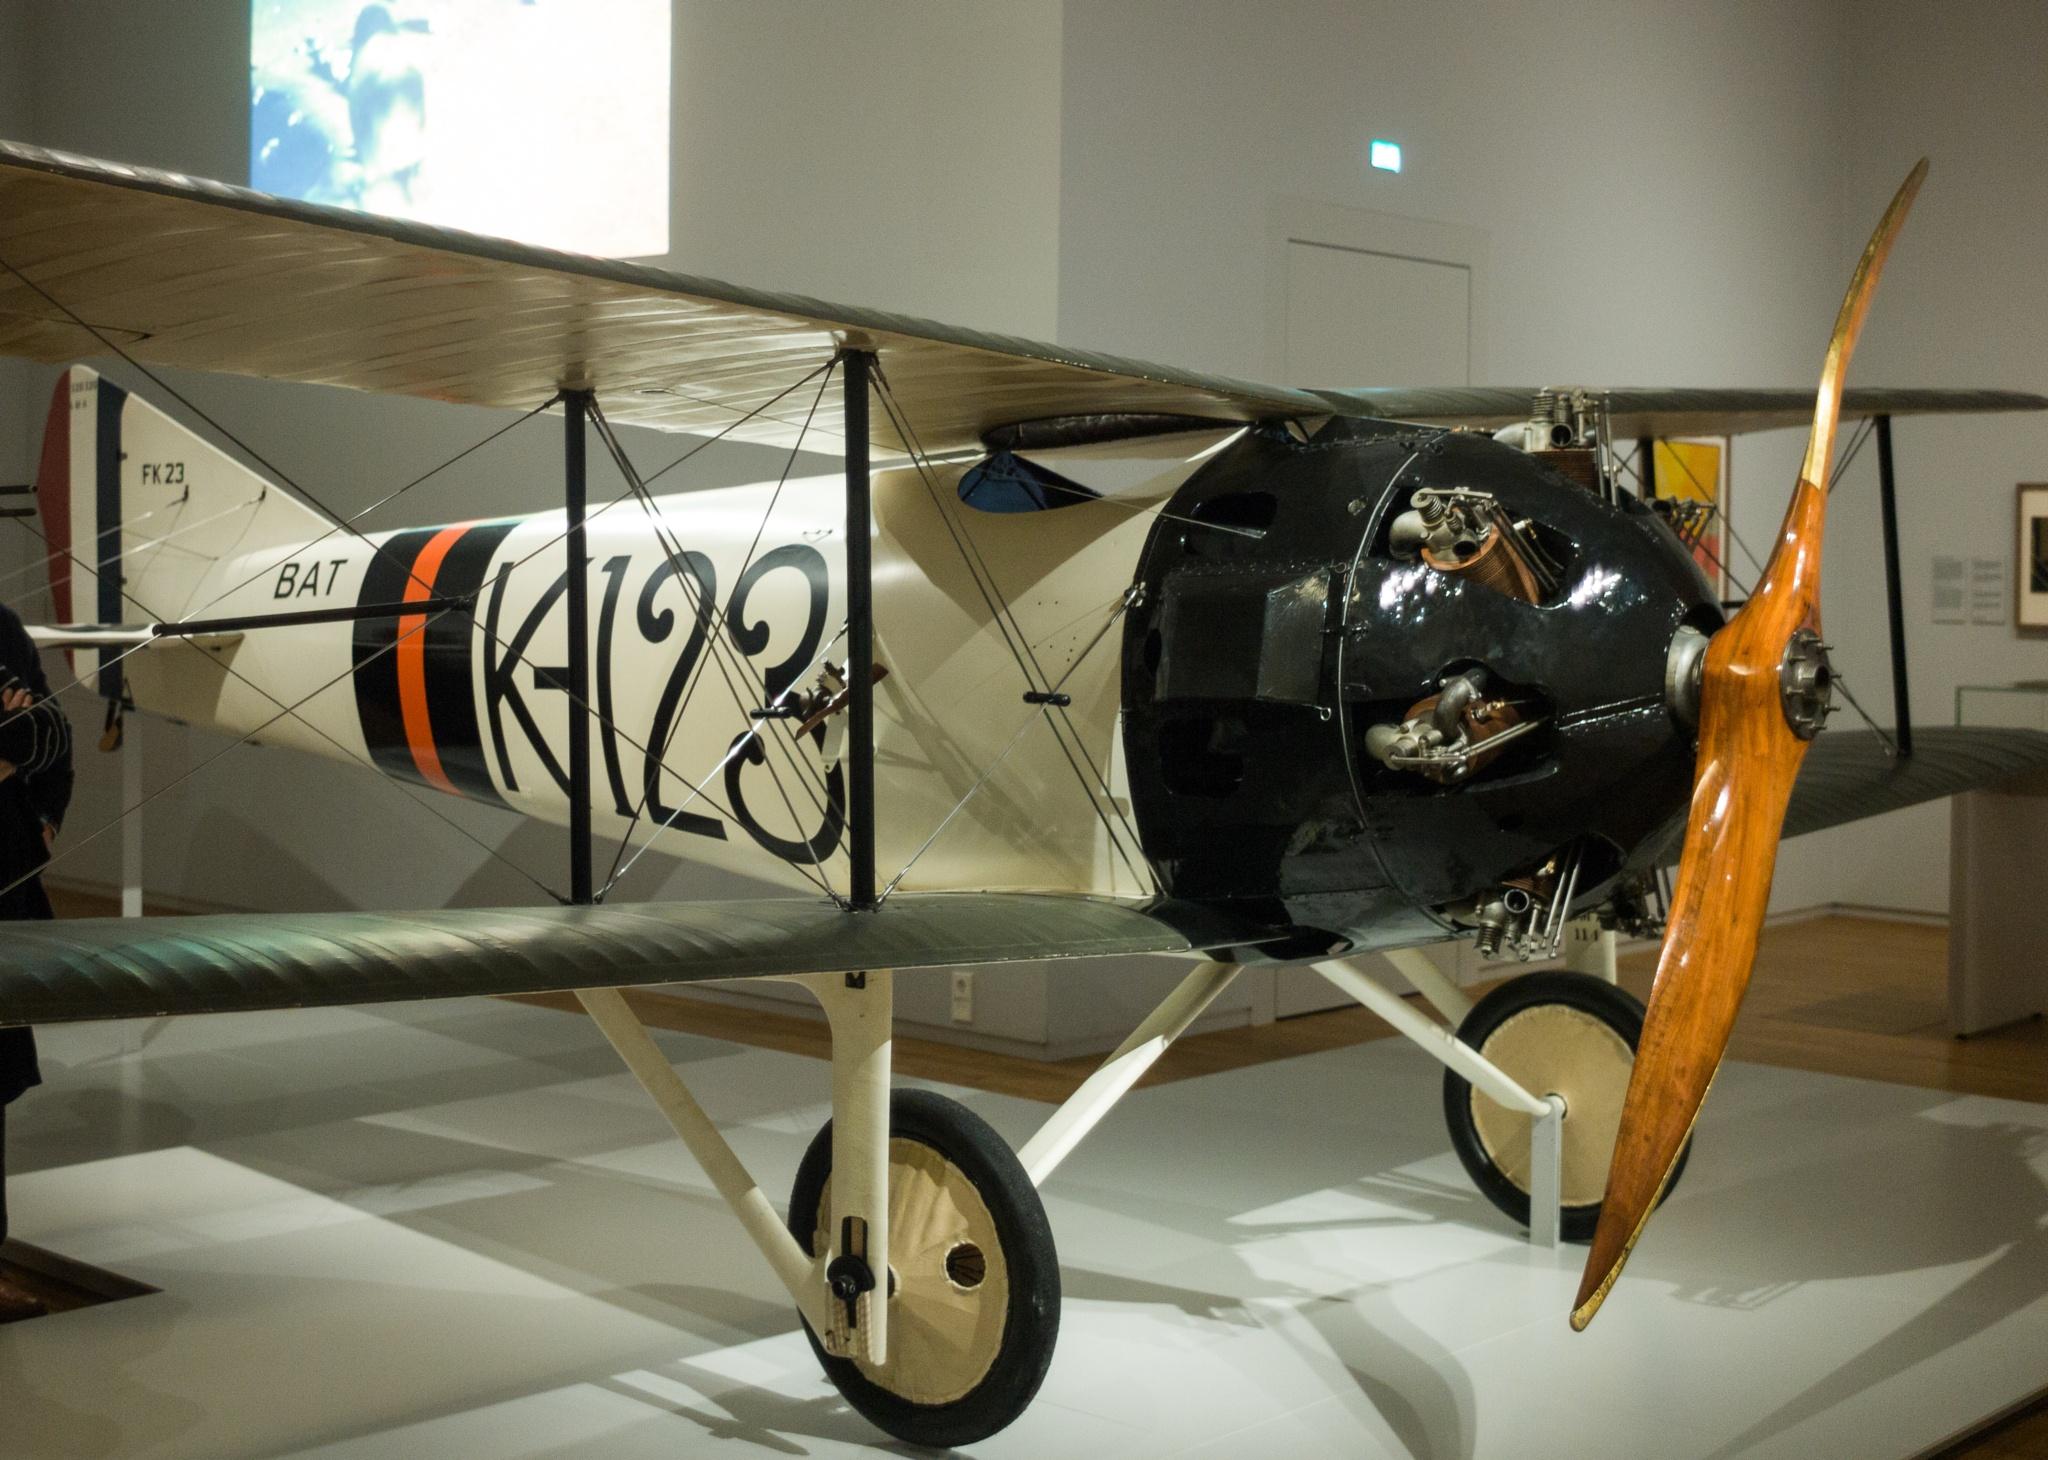 FK 23 Bantam - Rijsmuseum - Amsterdam by escargo2k